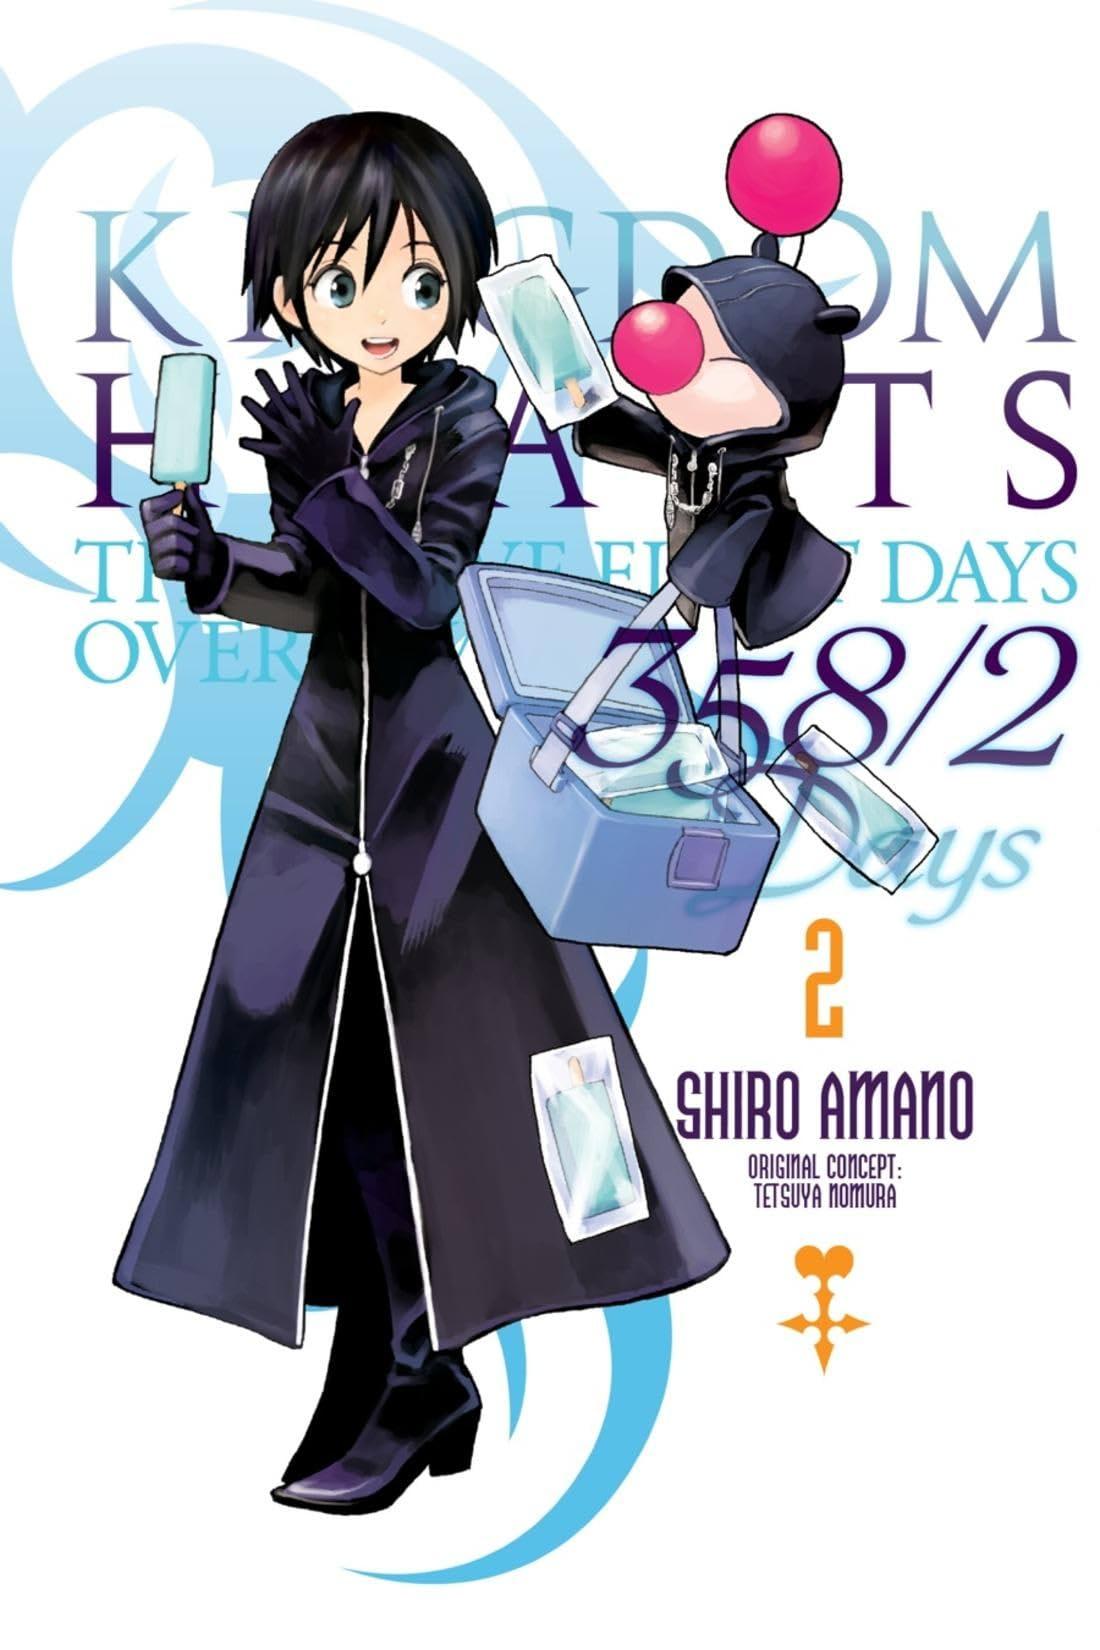 Kingdom Hearts 358/2 Days Vol. 2